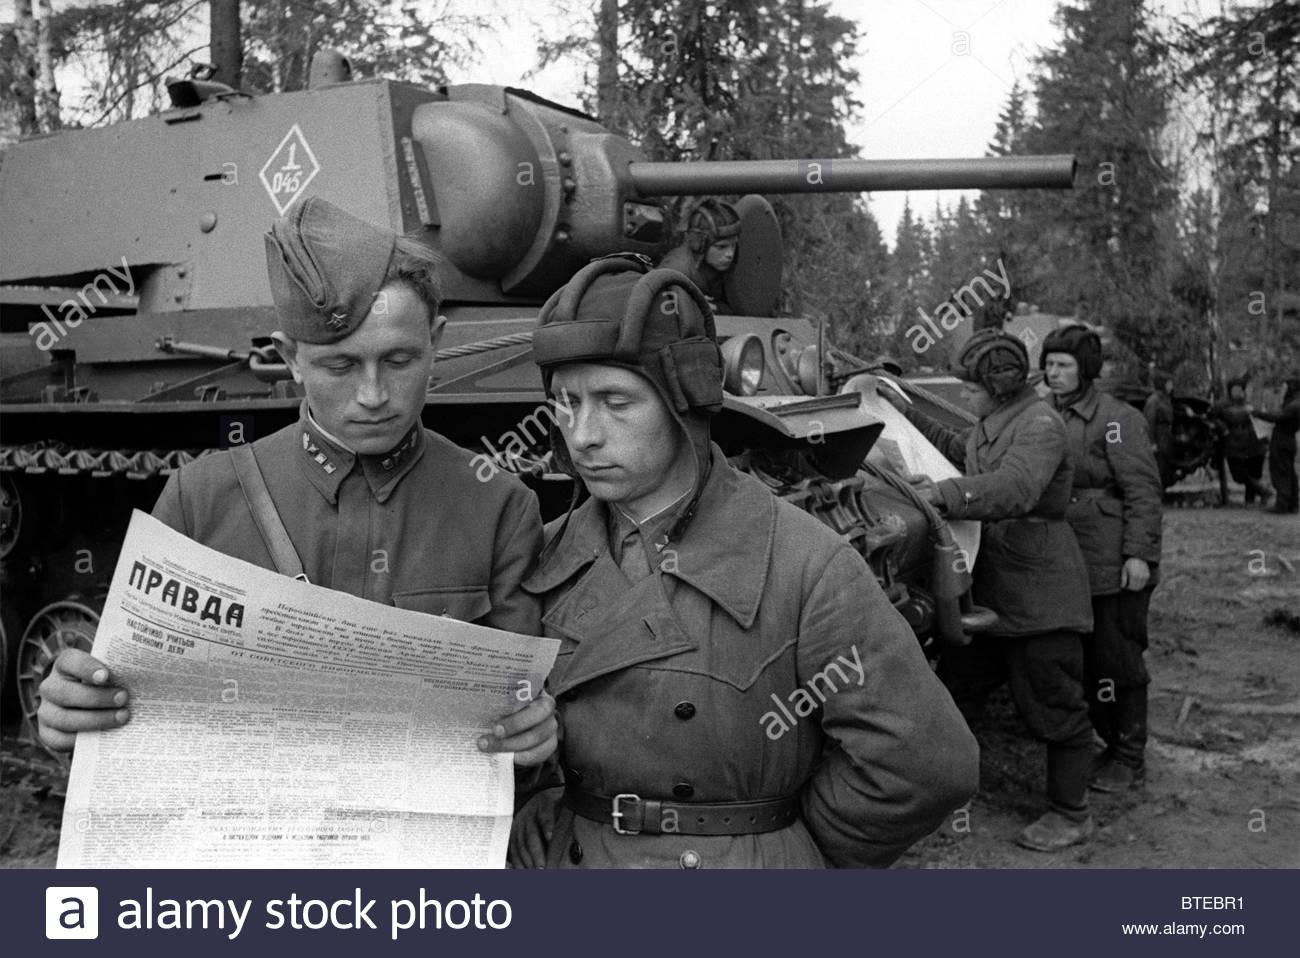 Great Patriotic War. Western Front, 1942 - Stock Image